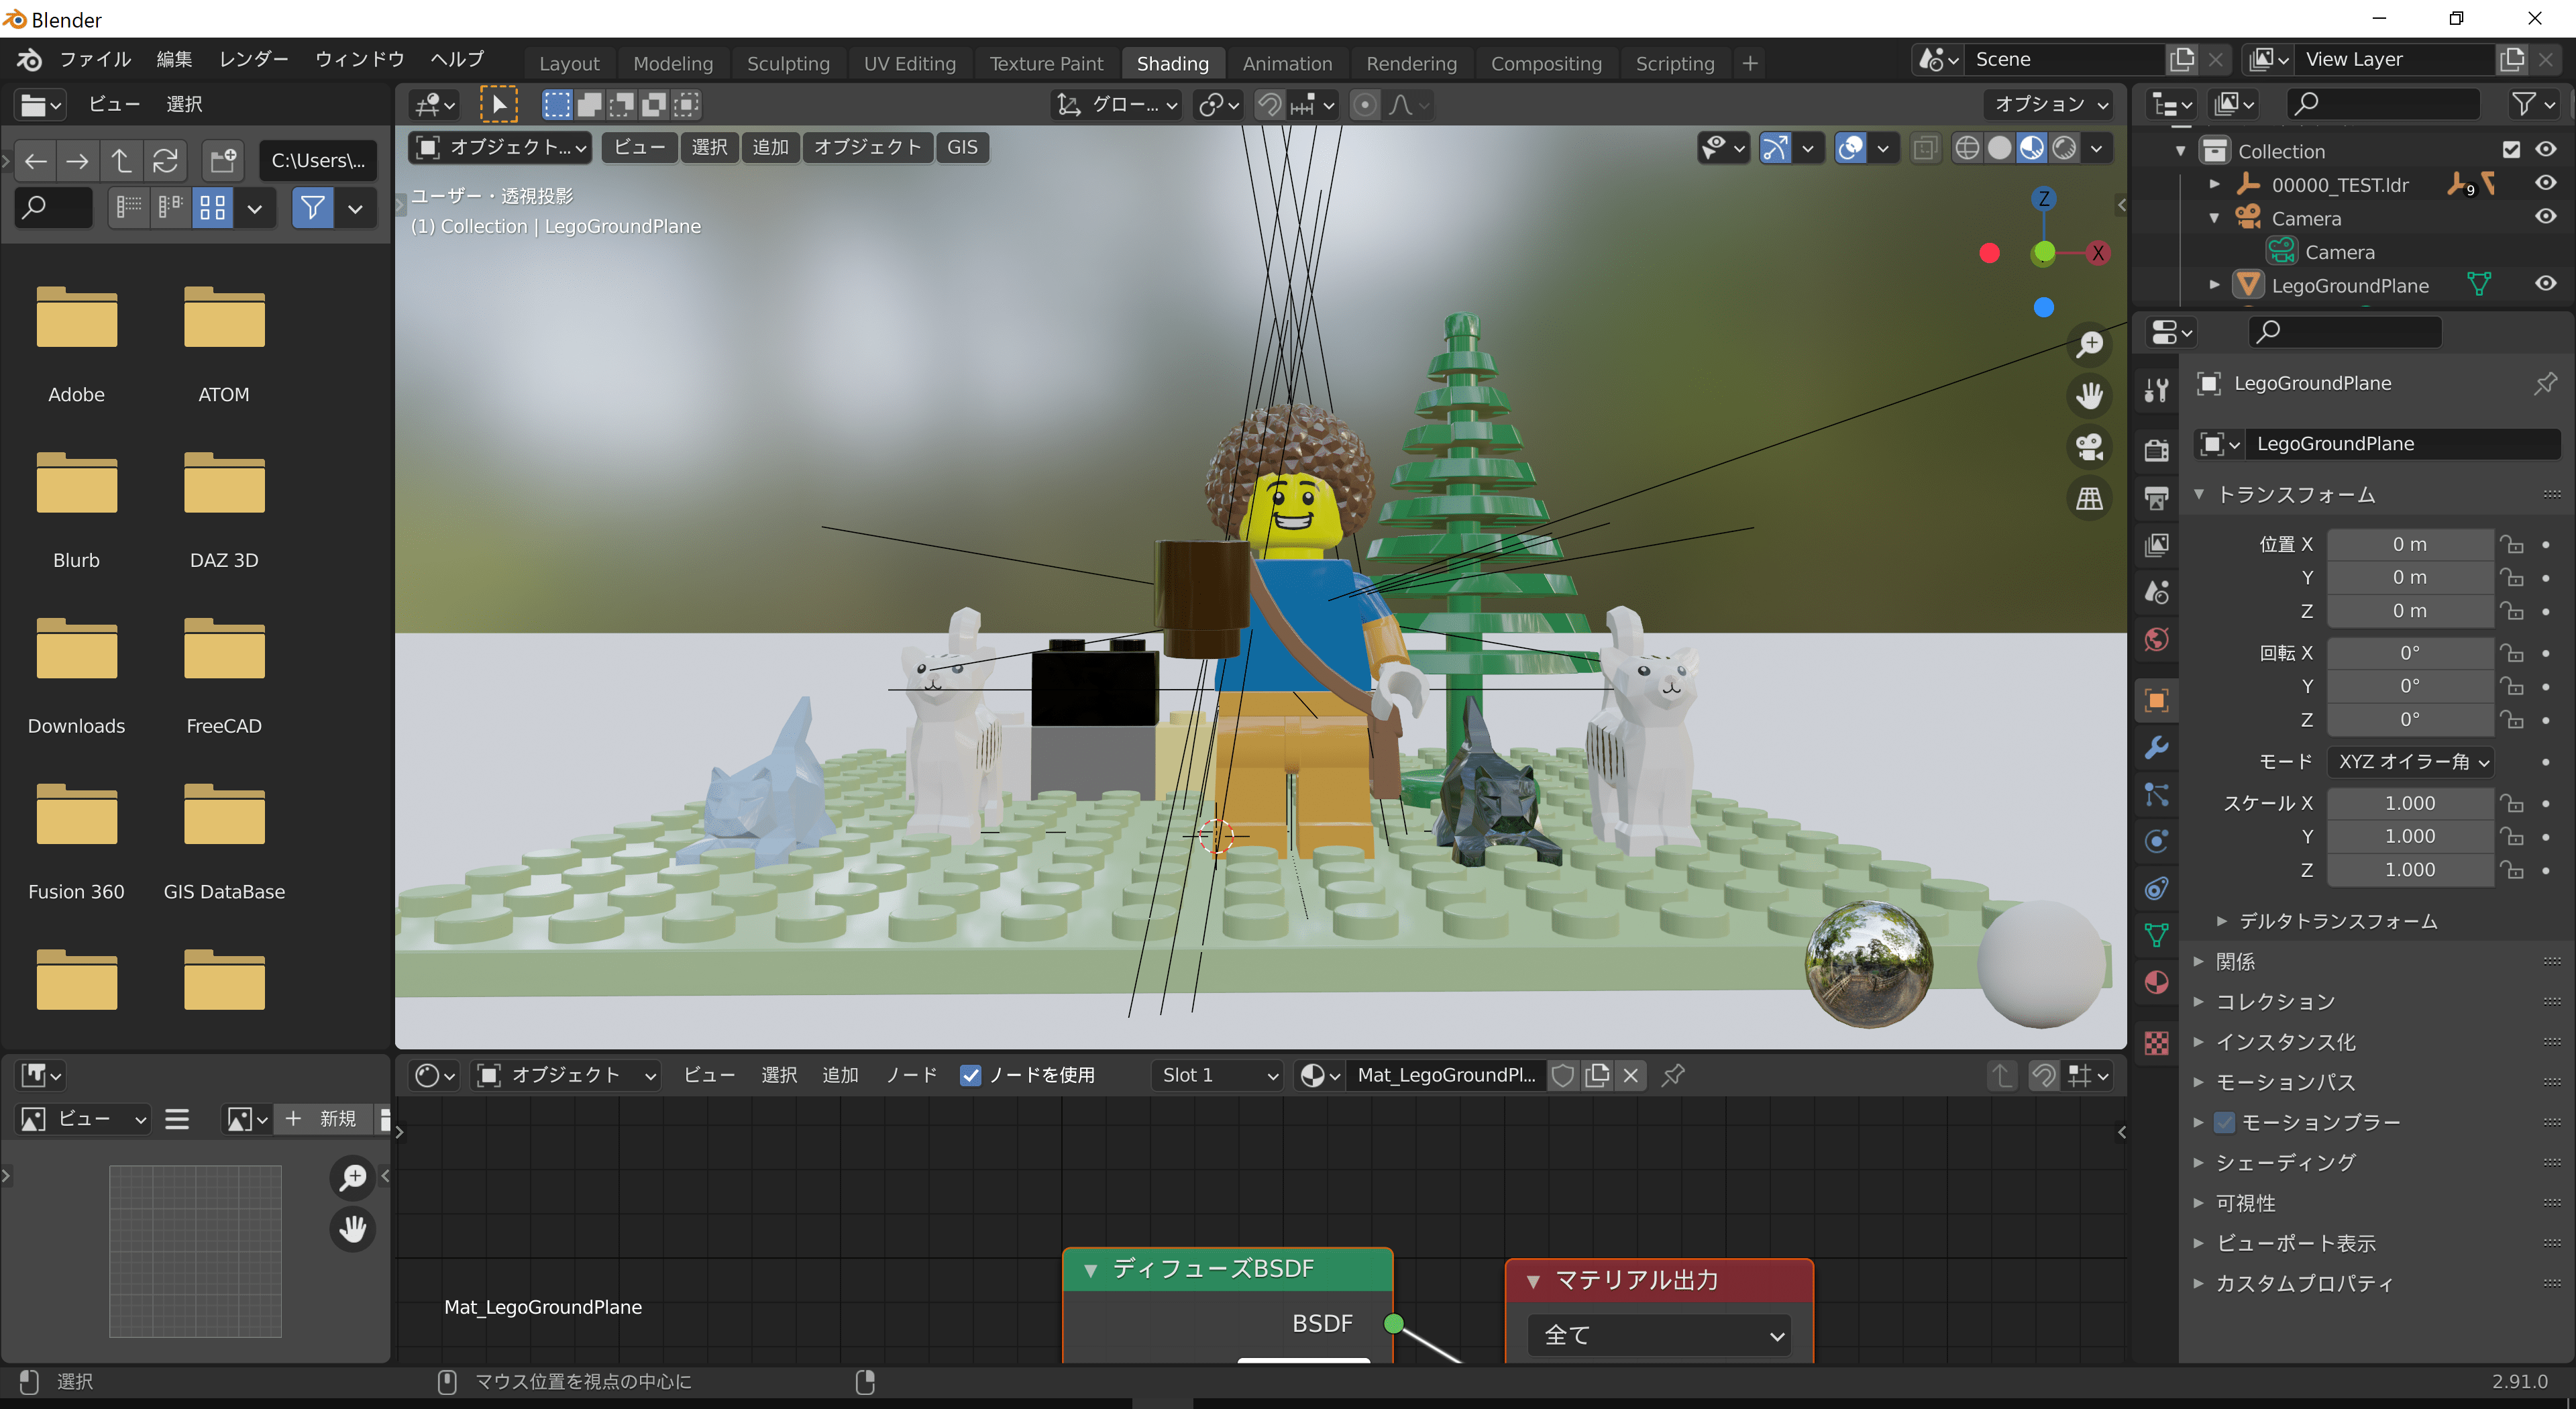 BlenderによるBrickLink[Studio]LDraw形式読み込み